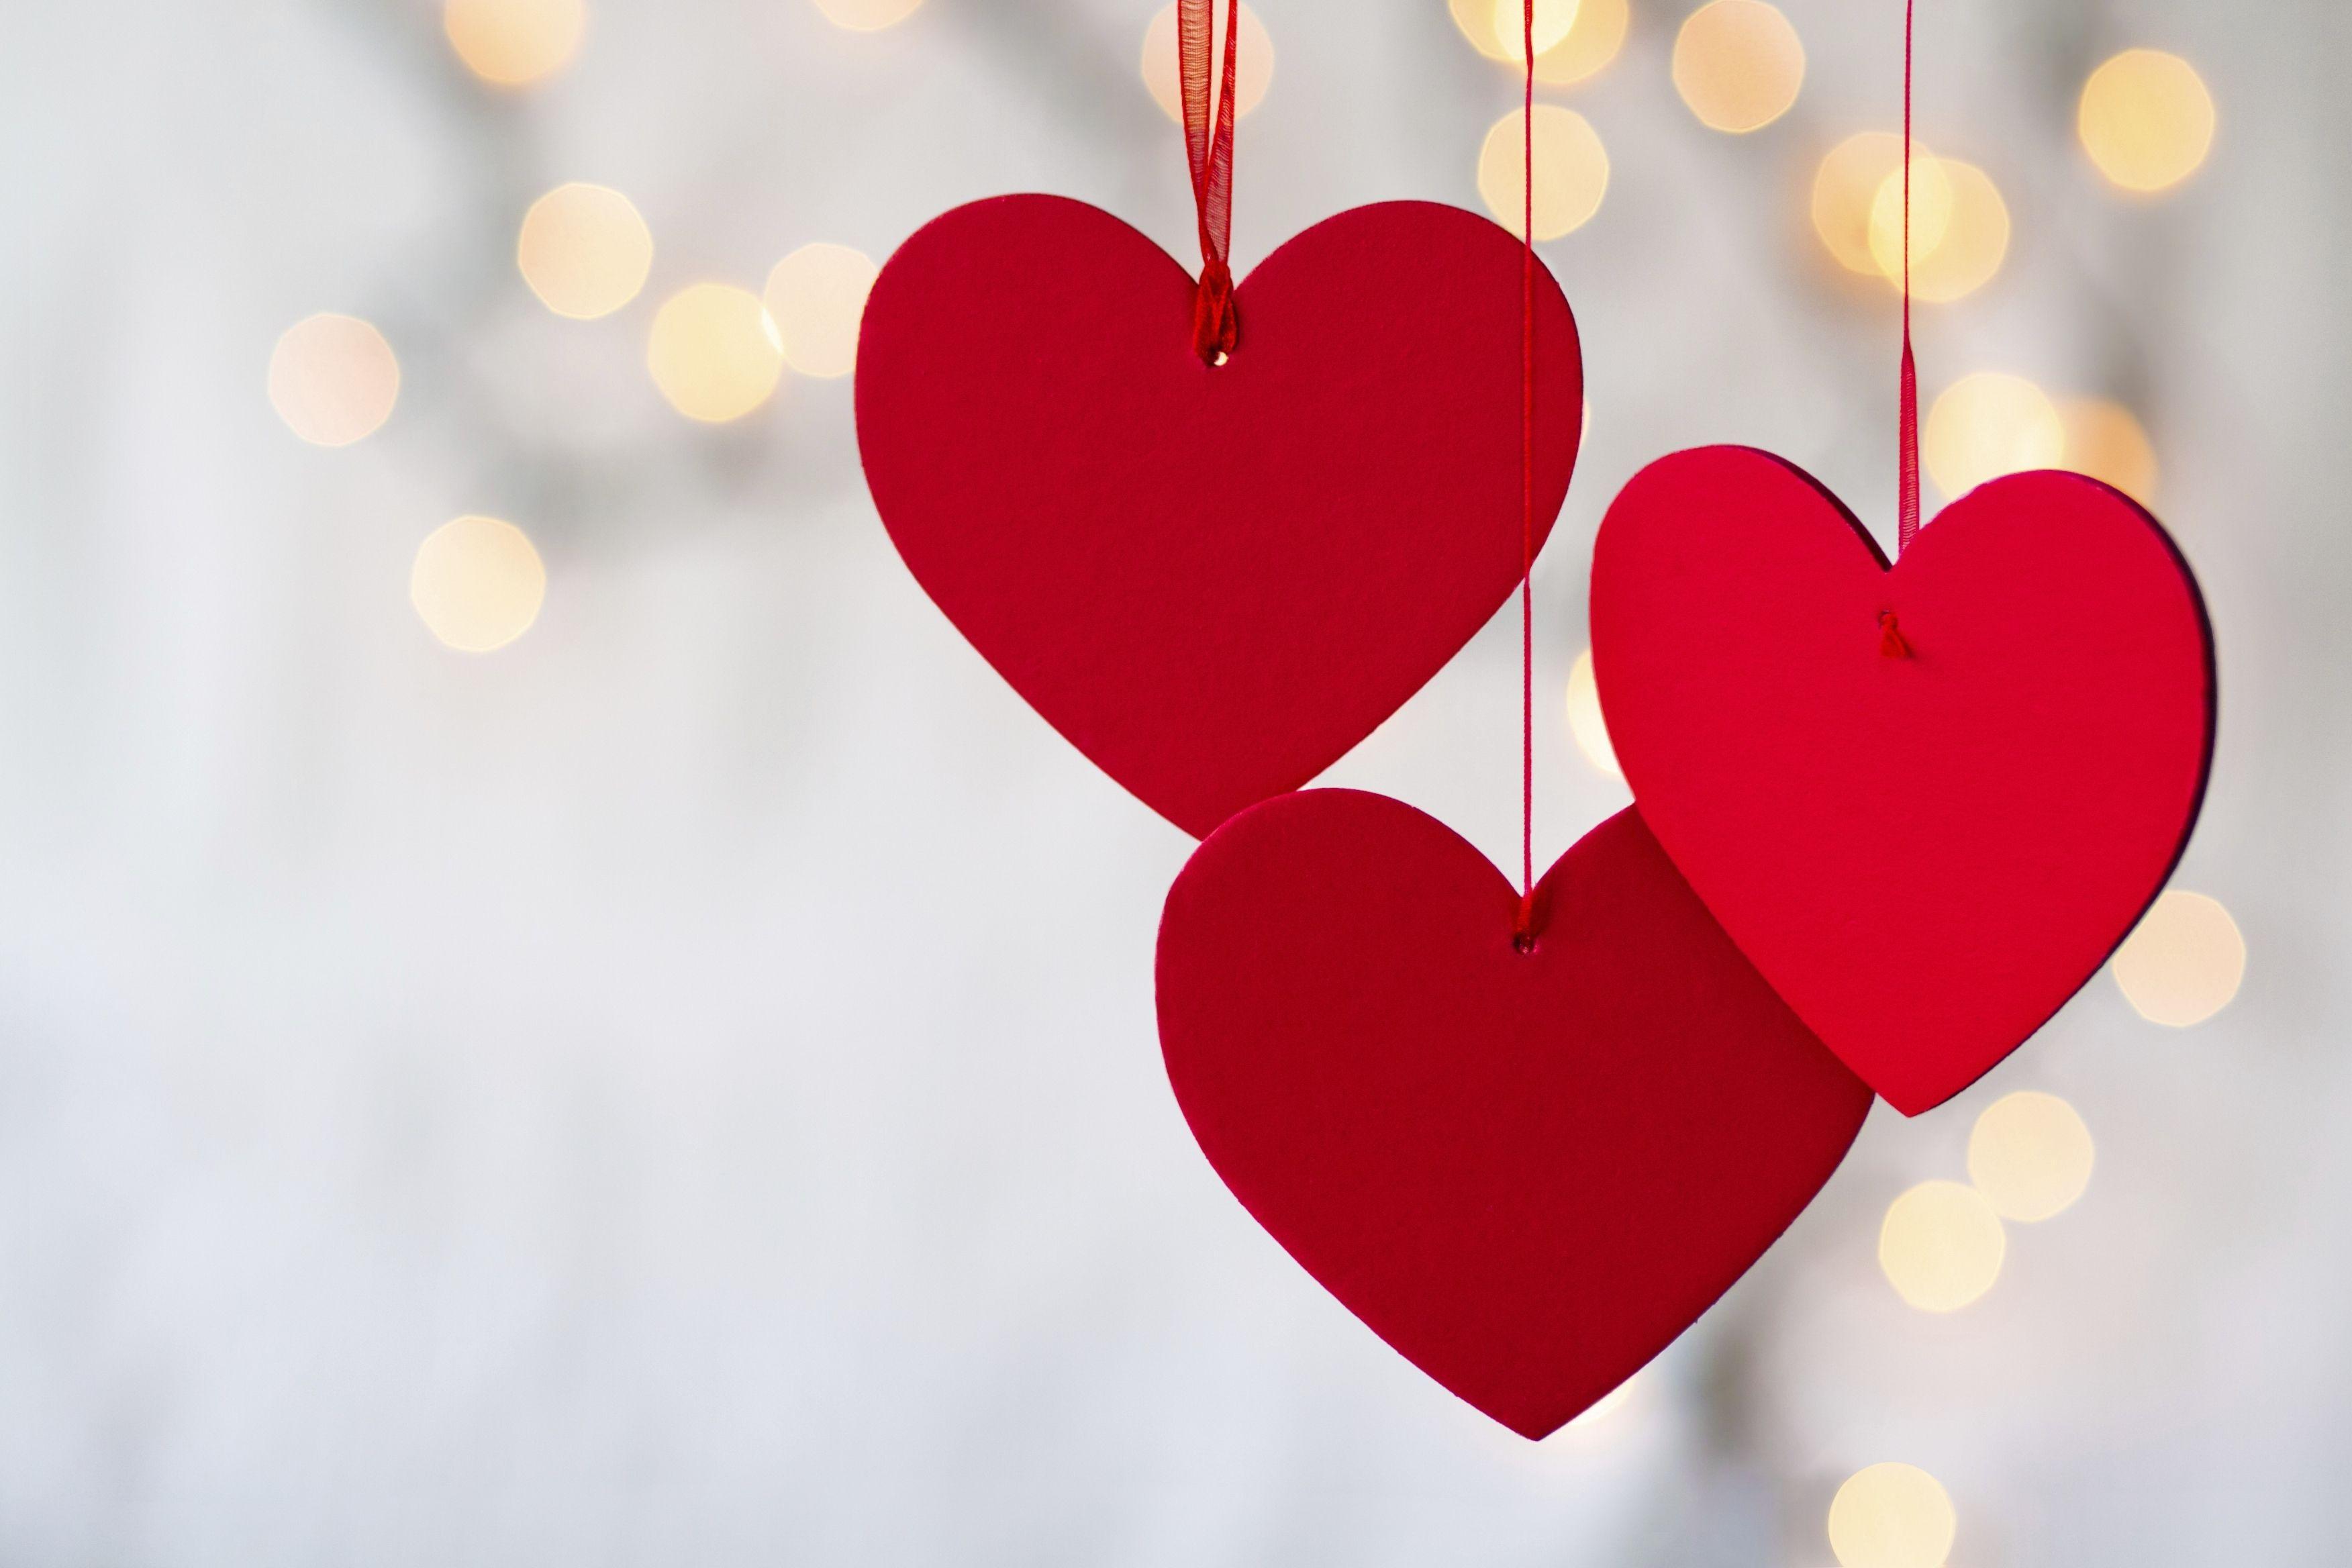 Valentine 39 s day desktop wallpapers top free valentine 39 s - San valentin desktop backgrounds ...